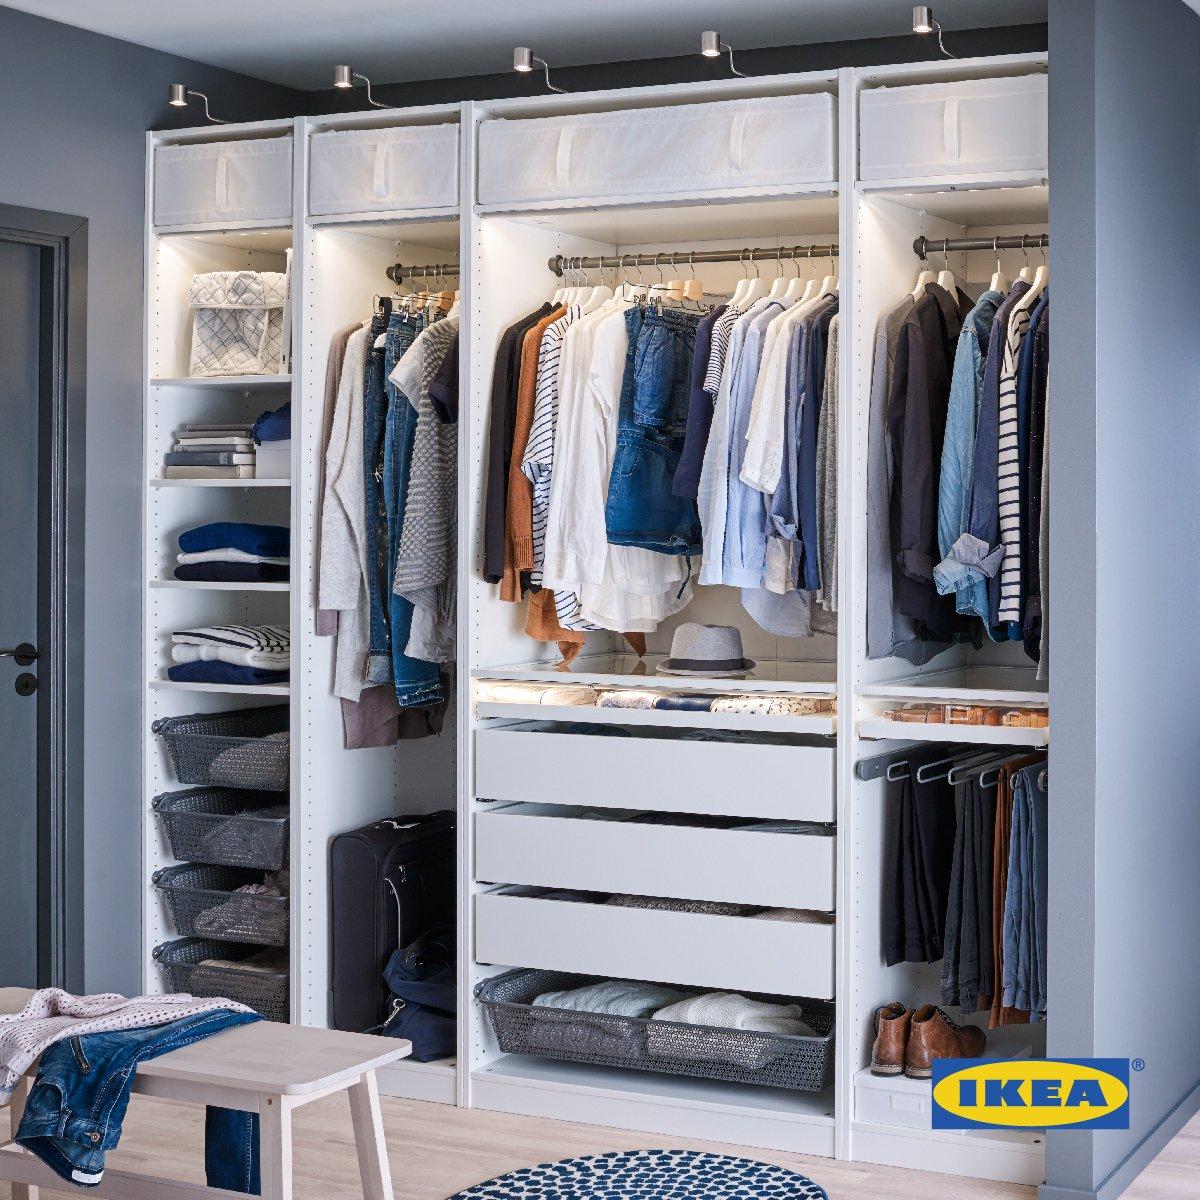 Ikea Pax Seclogonwebsite